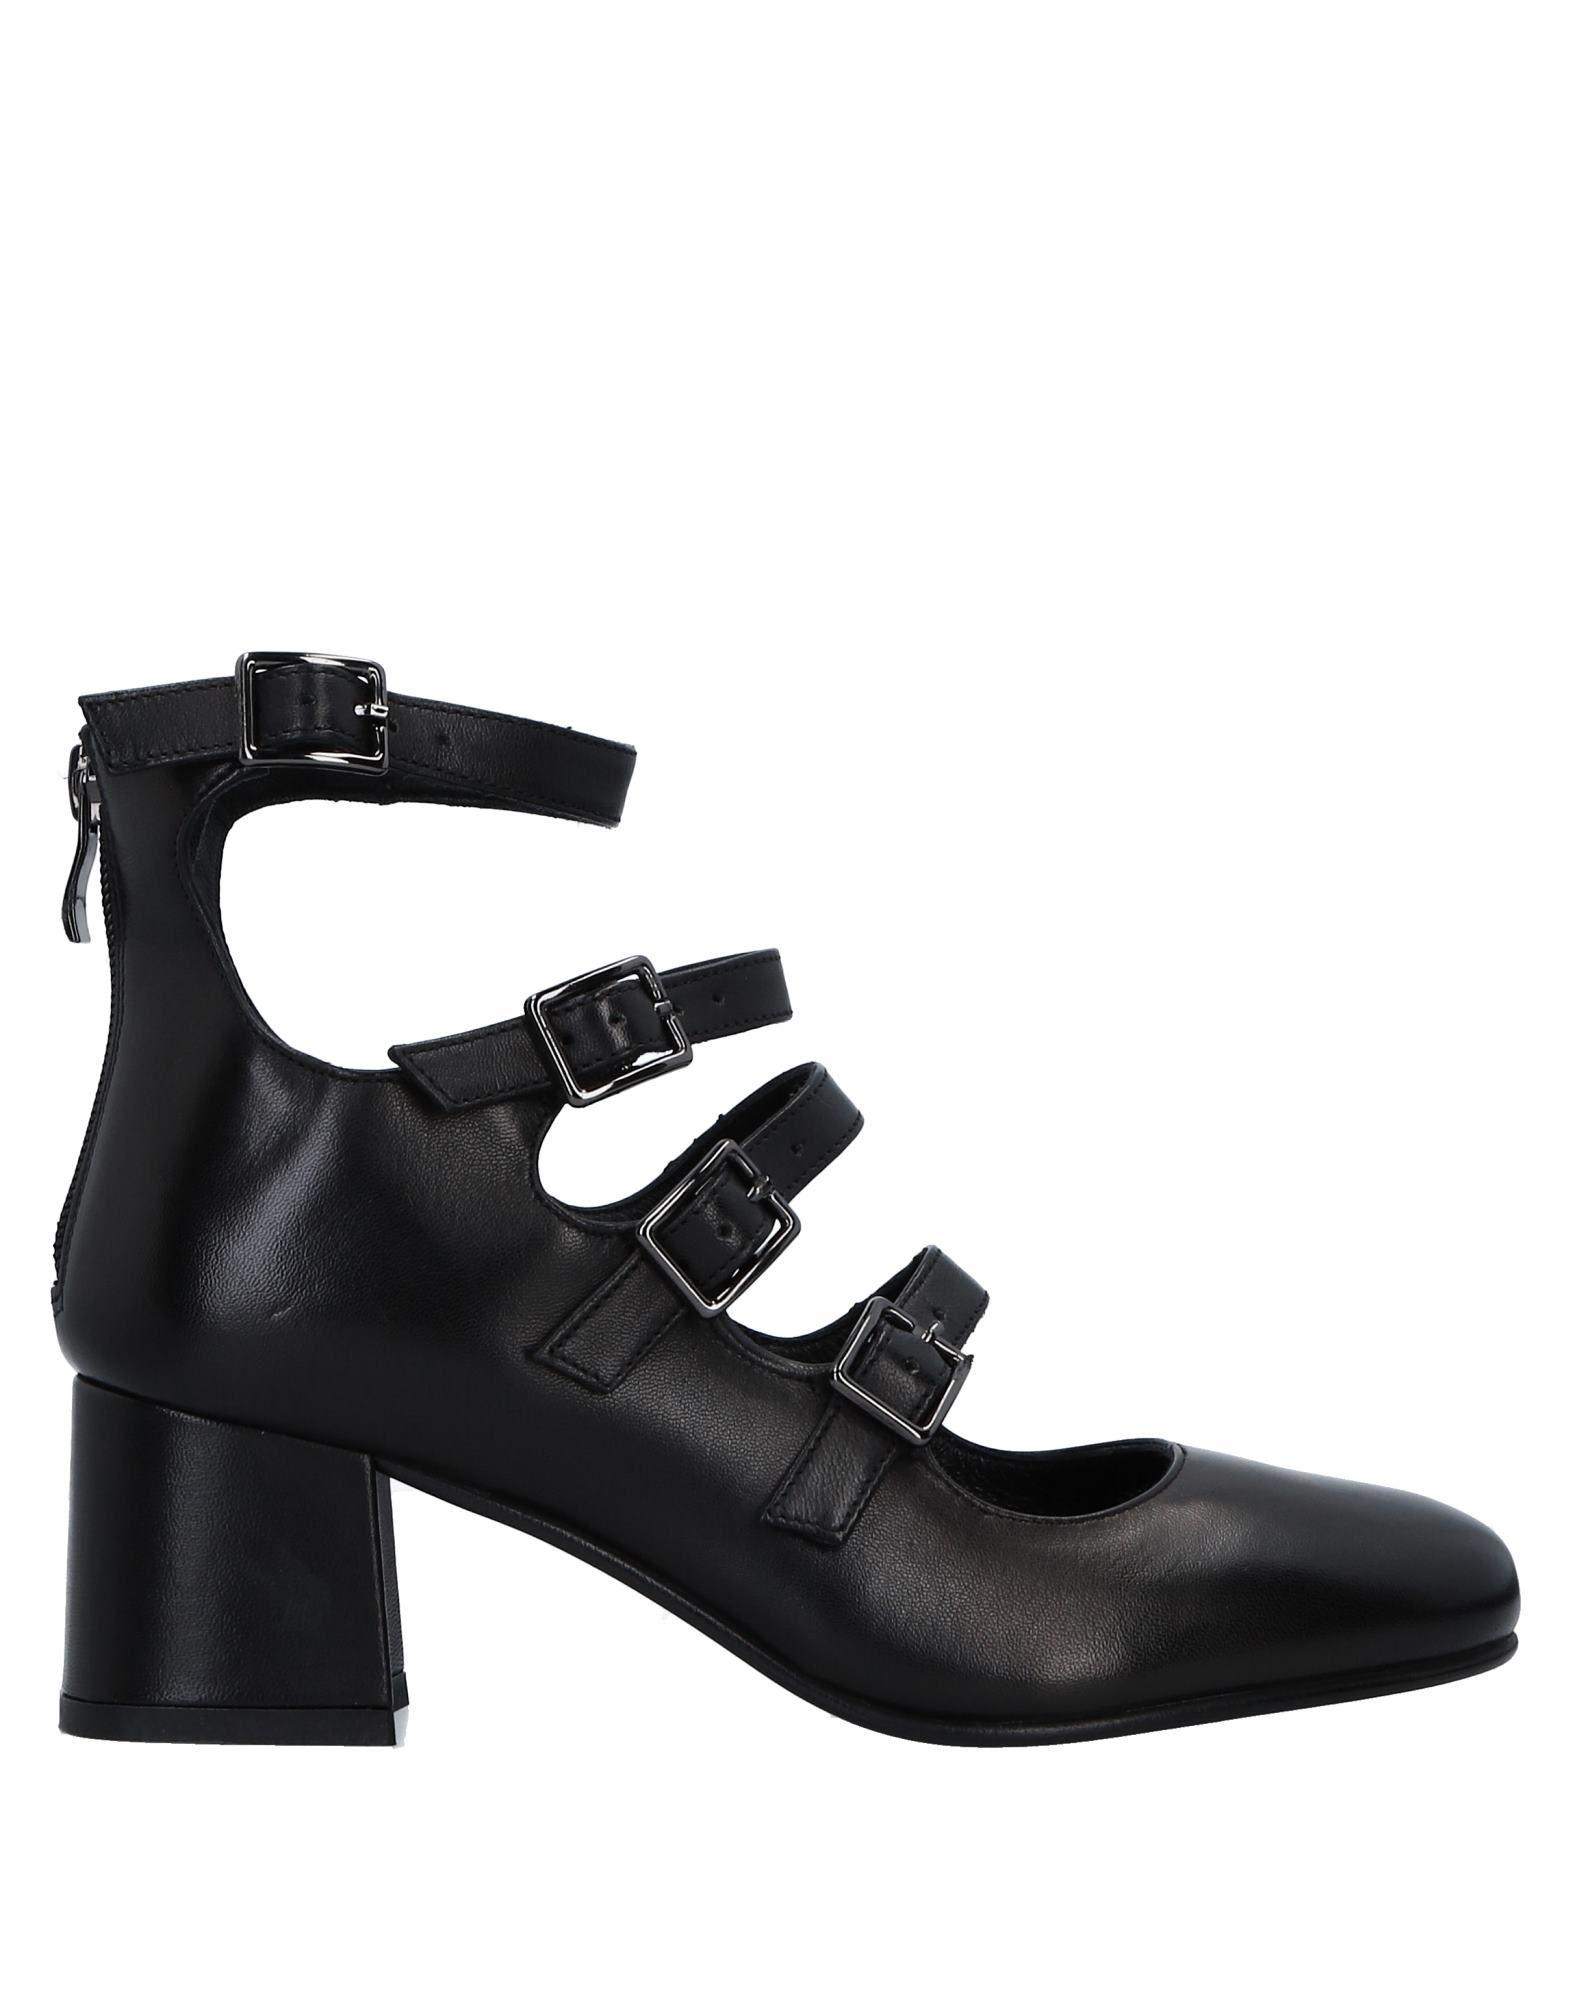 Four Five Gute Stiefelette Damen 11539065KO Gute Five Qualität beliebte Schuhe 74b81e